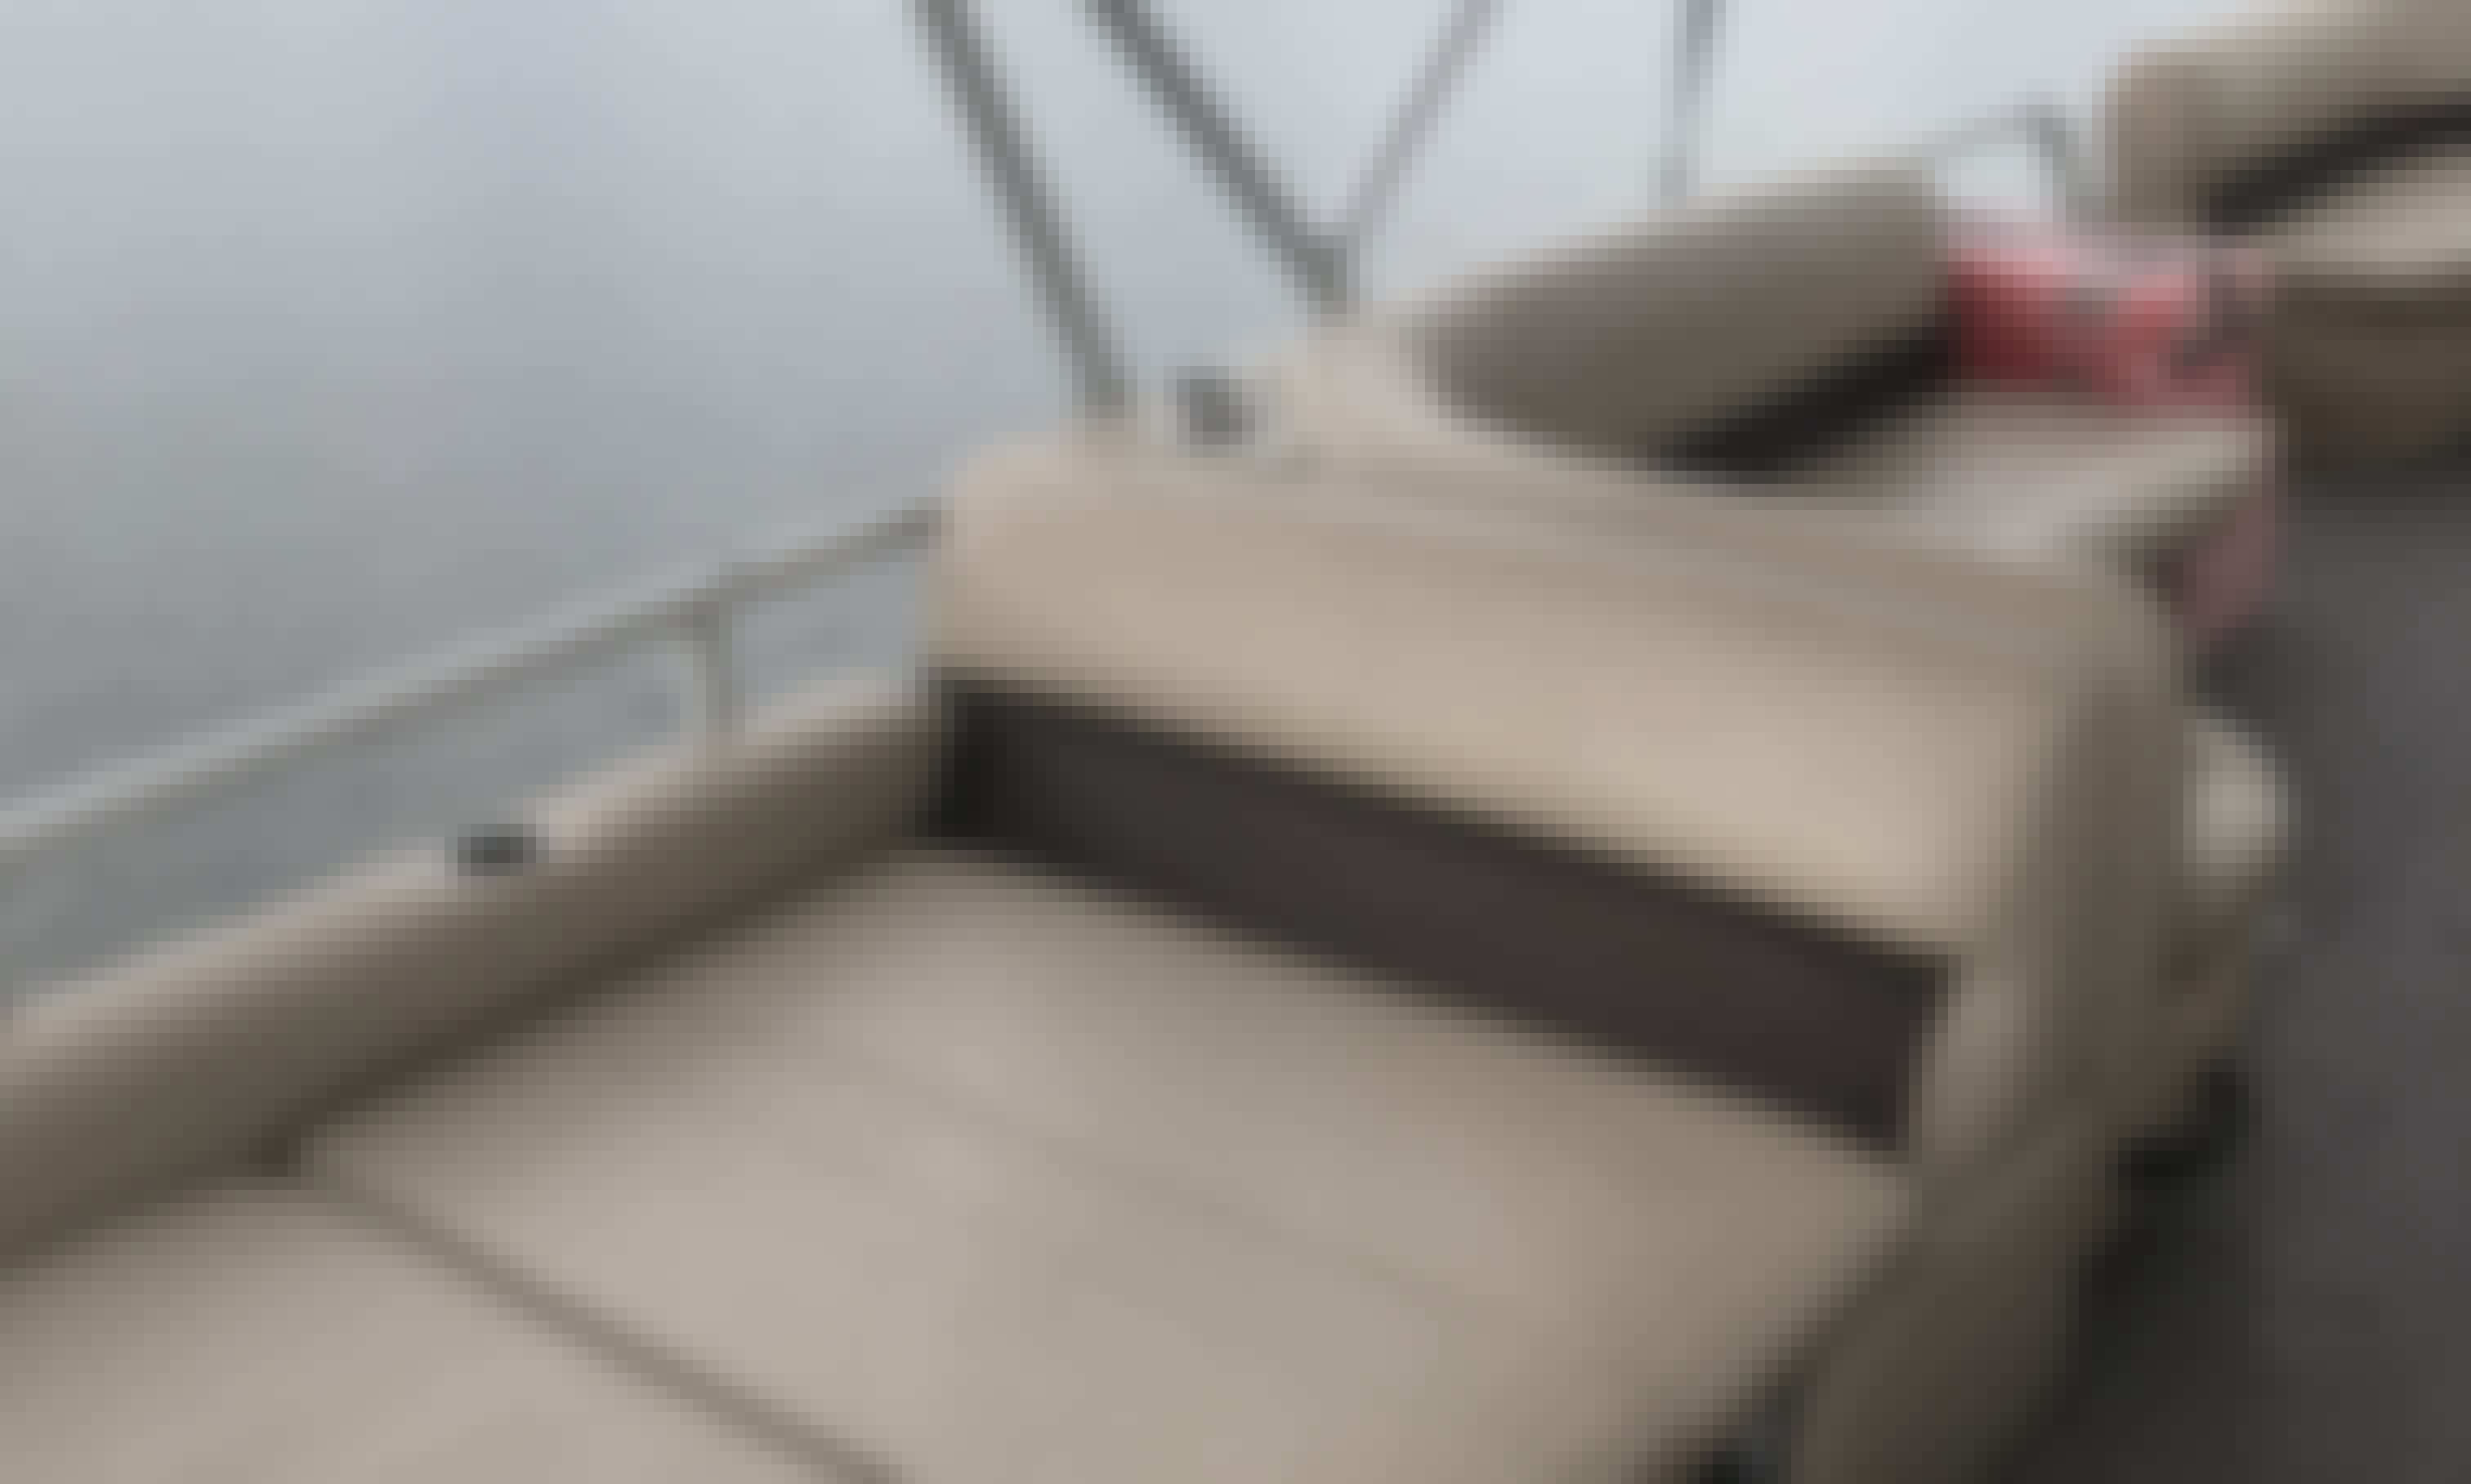 Spacious 22' 115HP Luxury Pontoon boat for Hire in Lake Geneva, Wisconsin